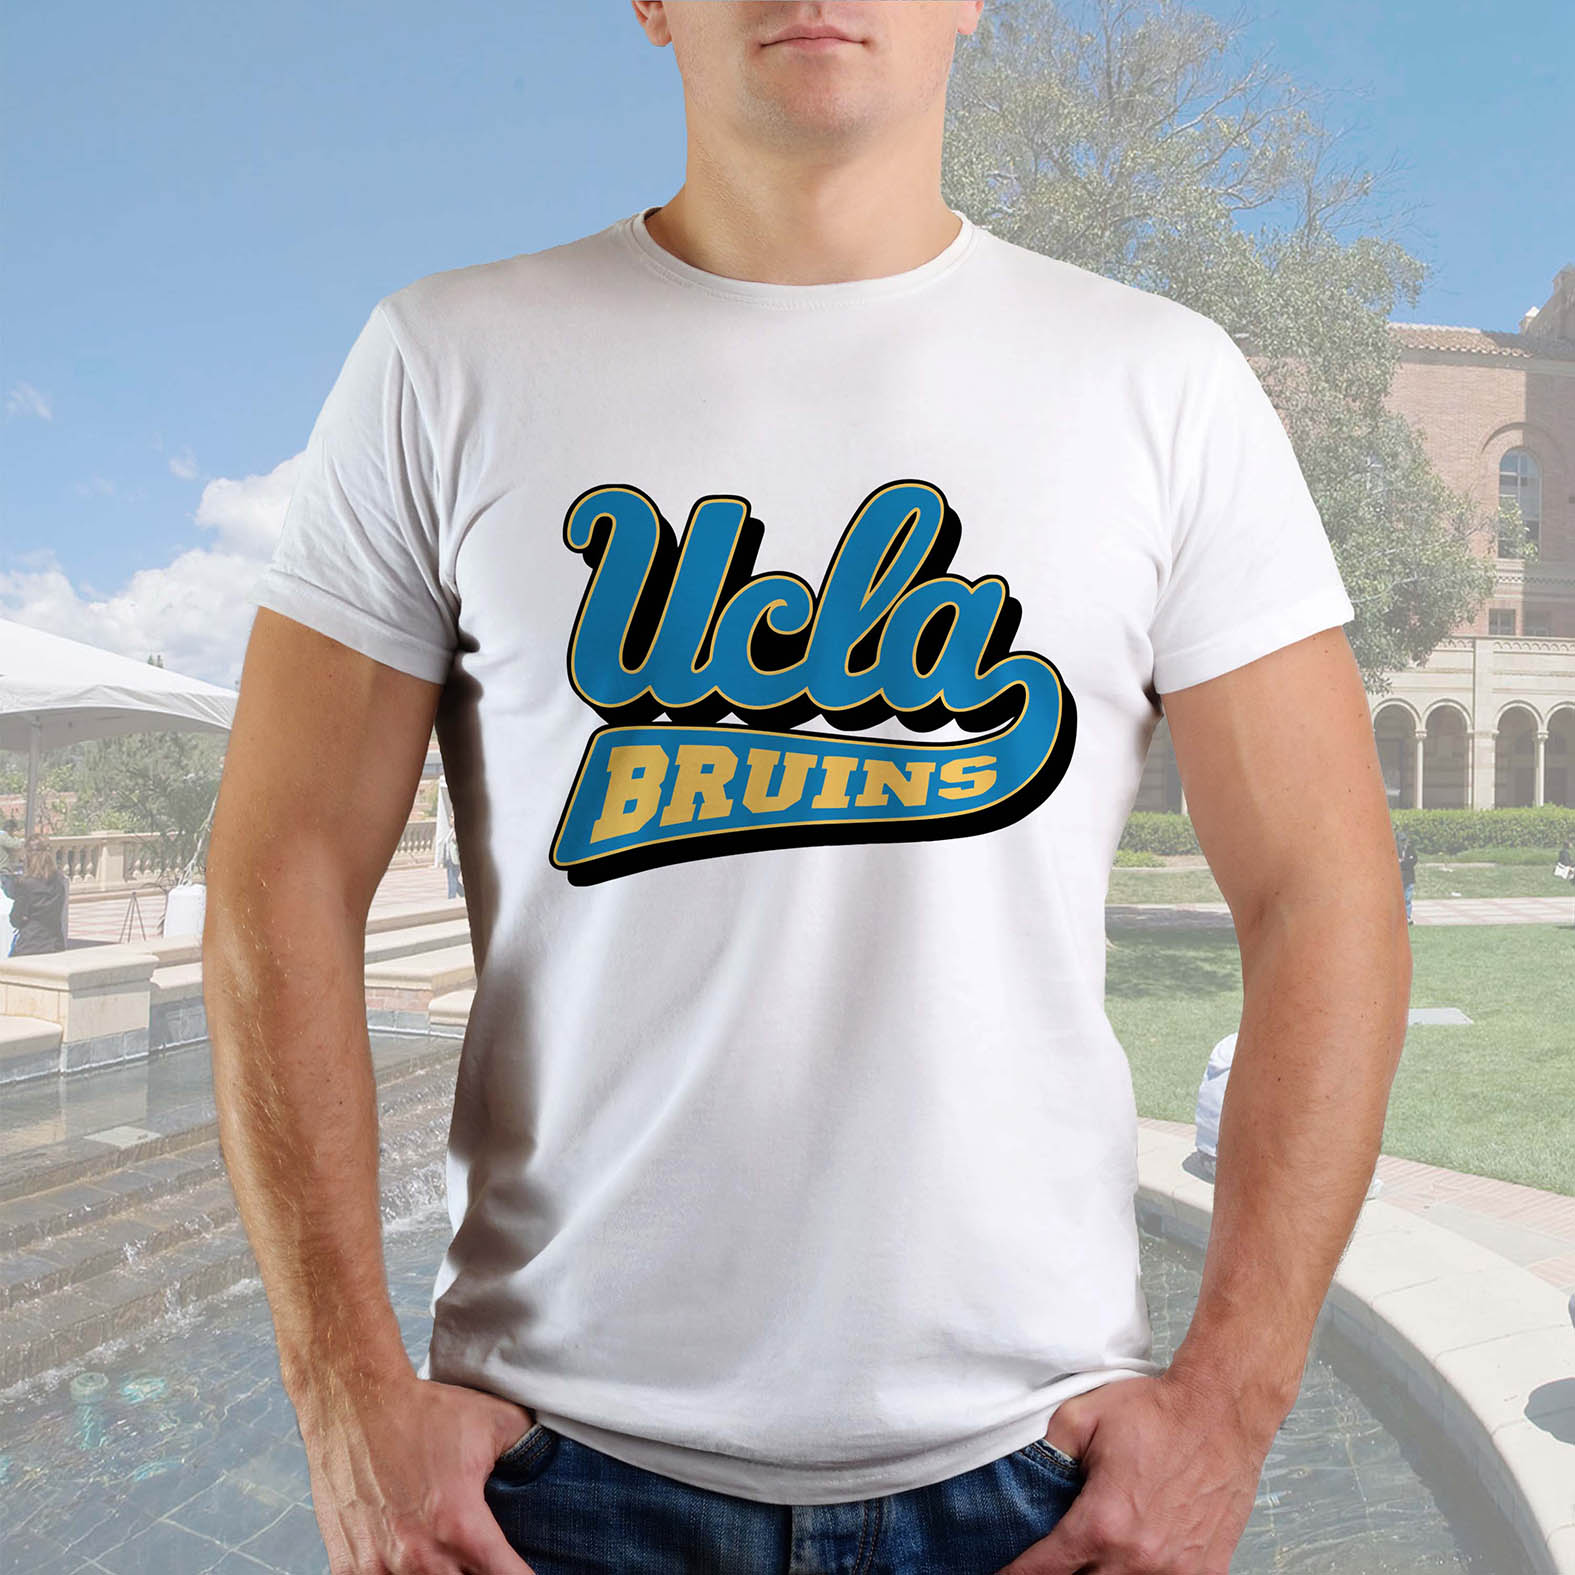 Camiseta Masculina Unissex Ucla Bruins Universidade da Califórnia Los Angeles Equipe Atlética University (Branca) - EV